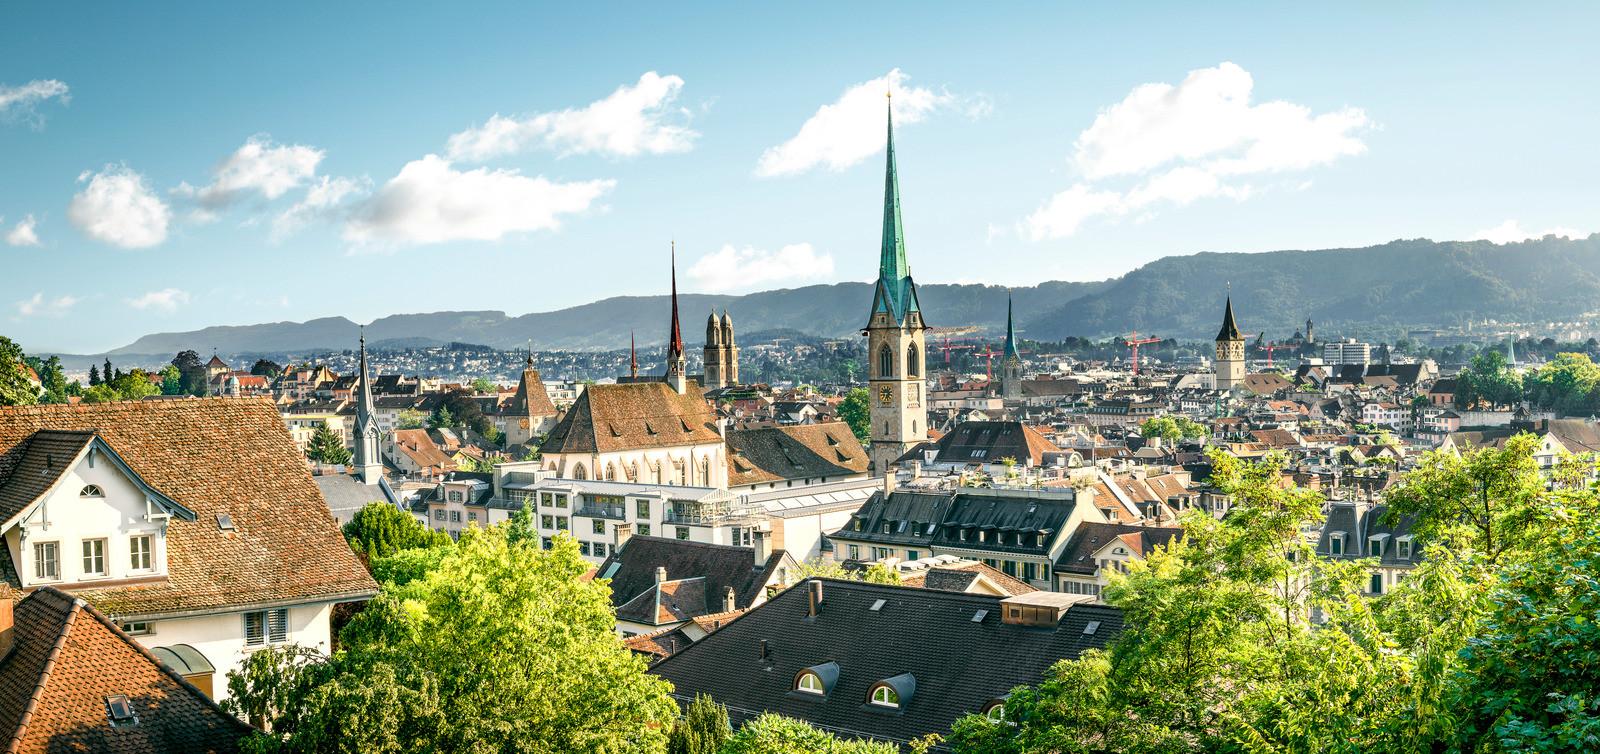 Canva - Panorama of Zurich, Switzerland.